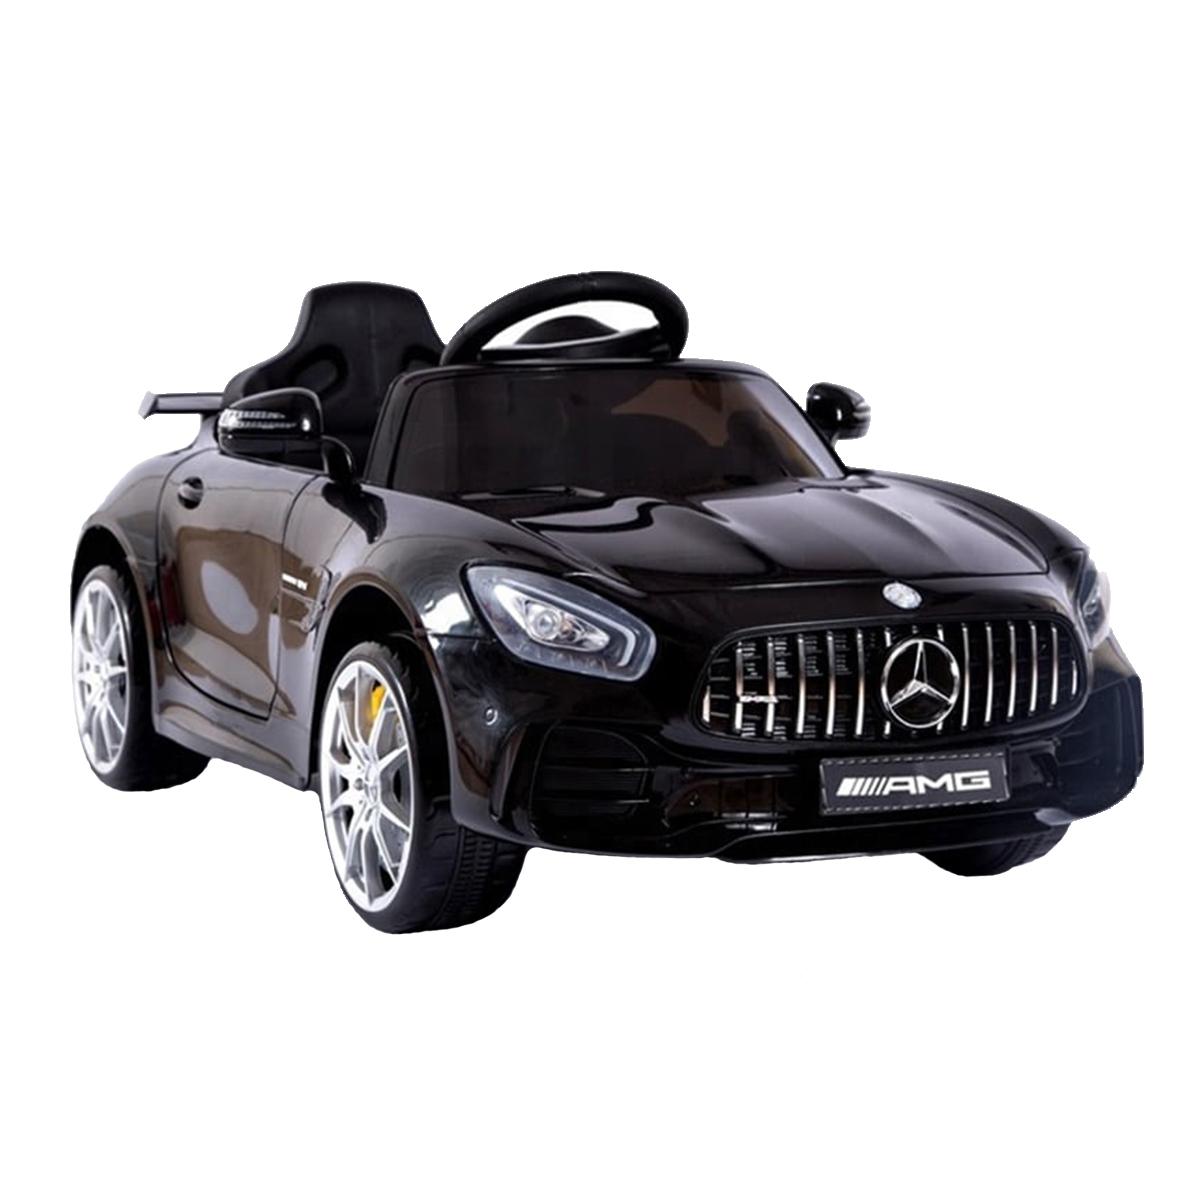 ماشین شارژی طرح بنز مدل AMG GT